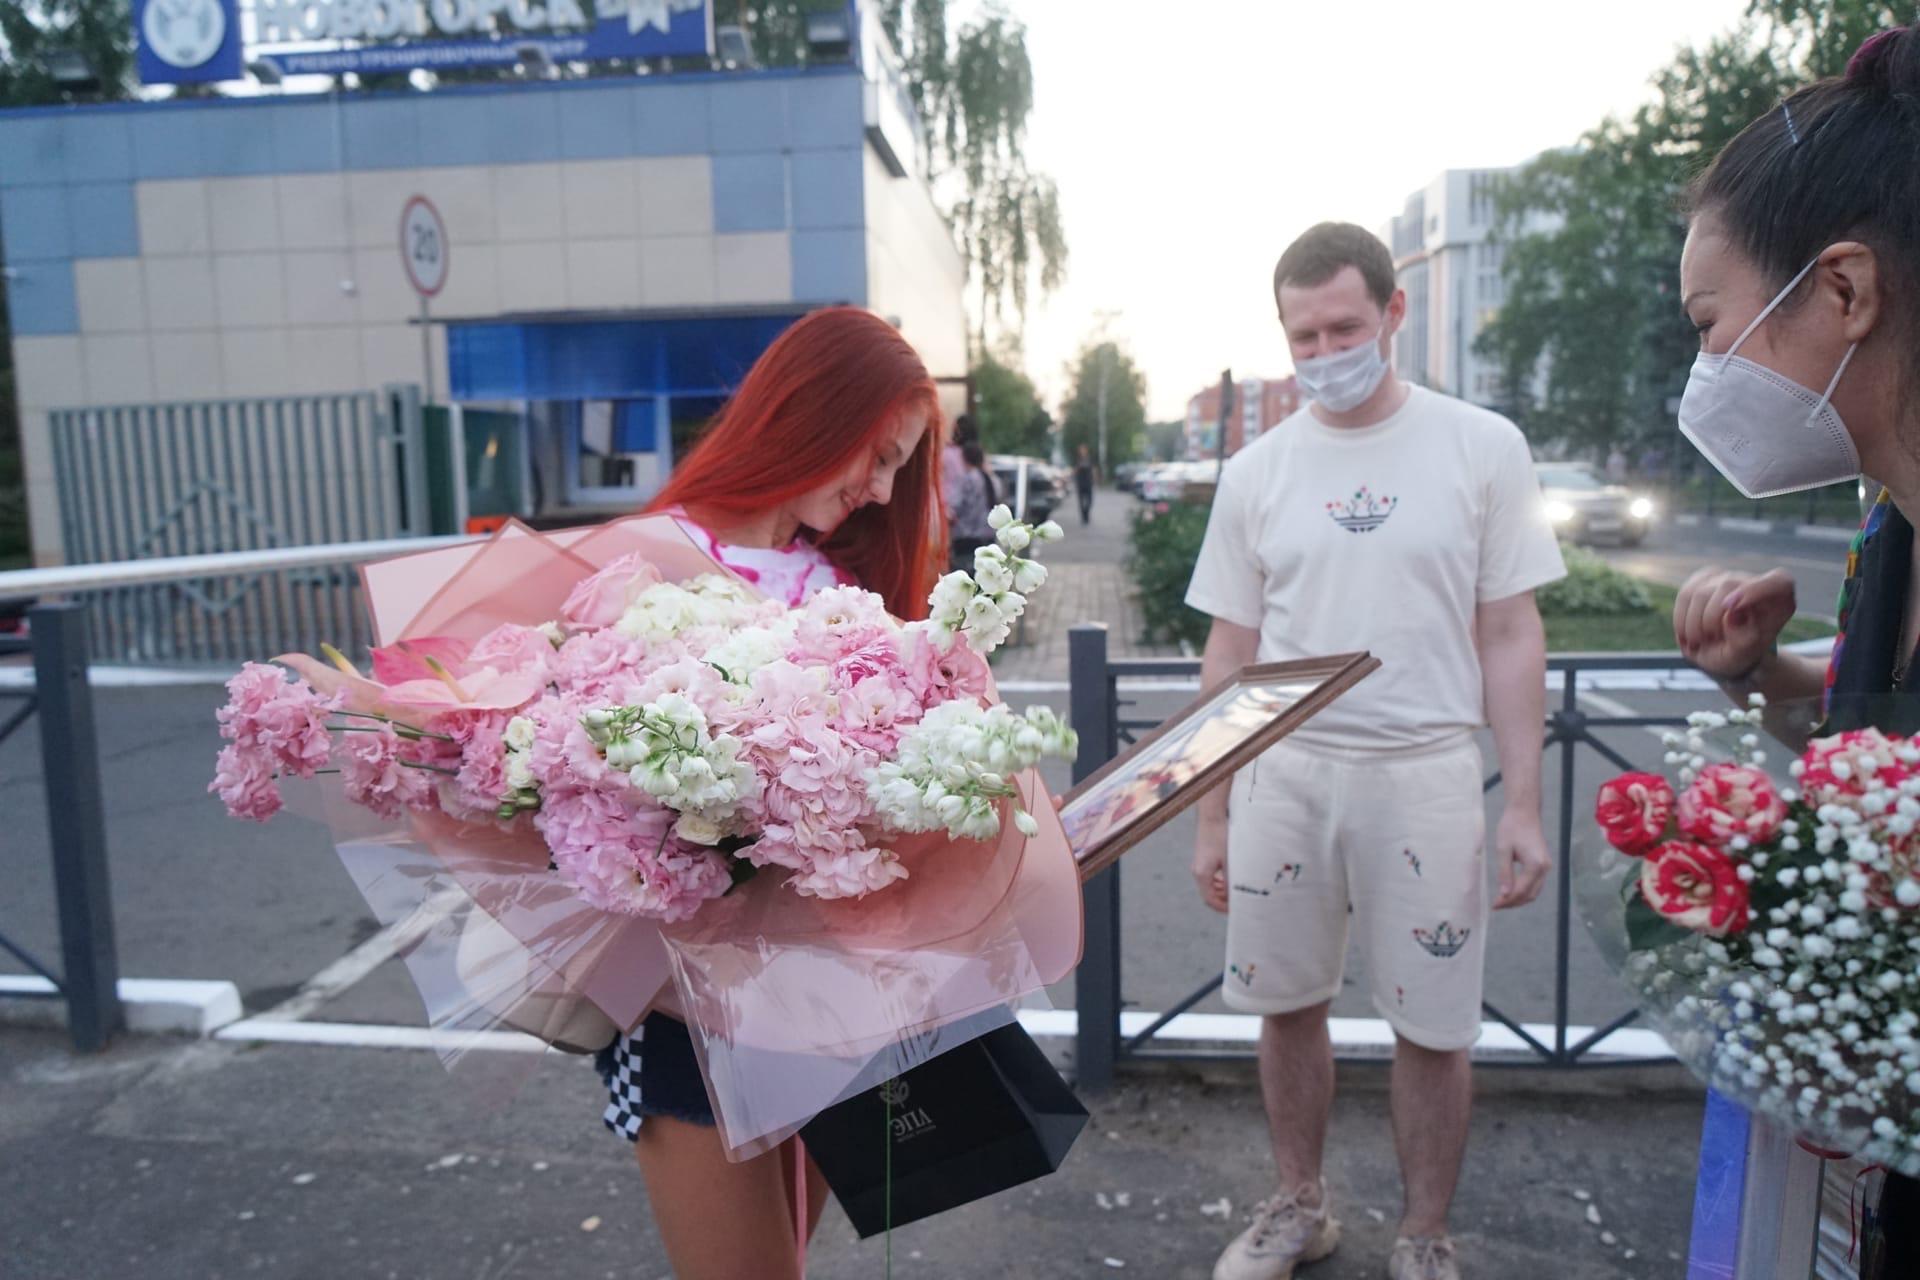 https://i3.imageban.ru/out/2021/06/24/95aac857920ae01ec04712d384b5f30d.jpg